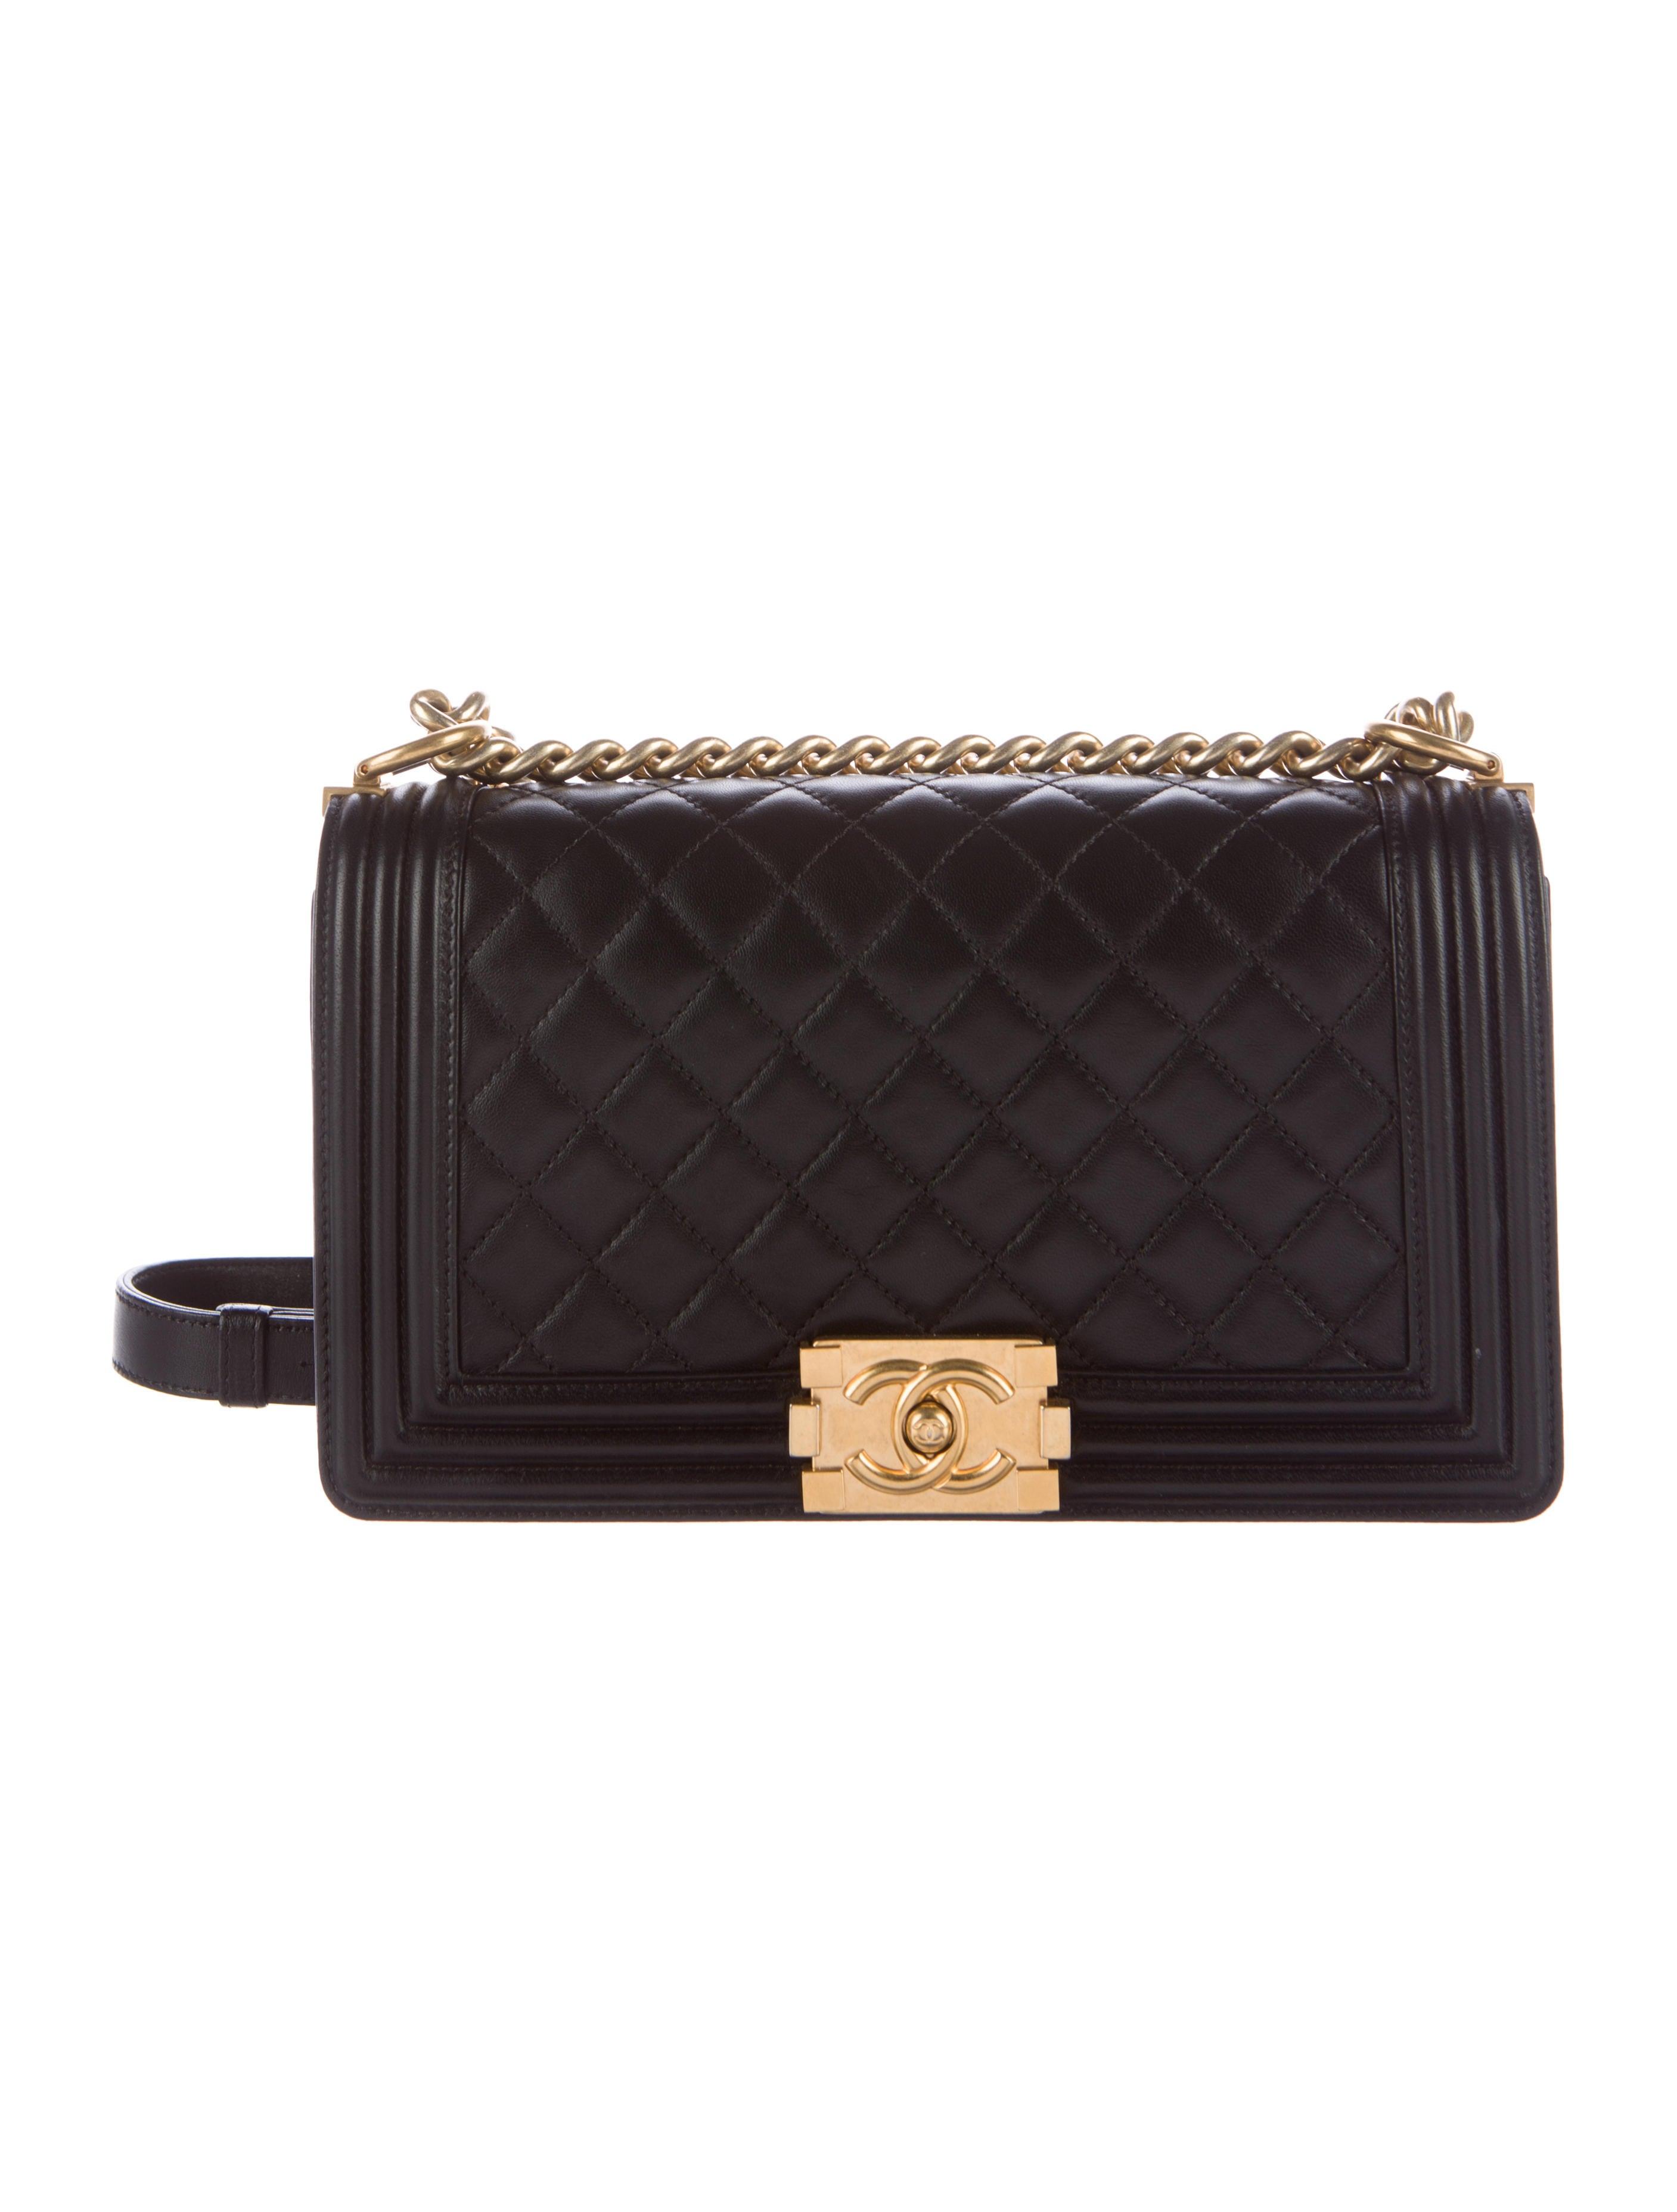 5306663f7eea Chanel Small Boy Bag - Handbags - CHA182847 | The RealReal